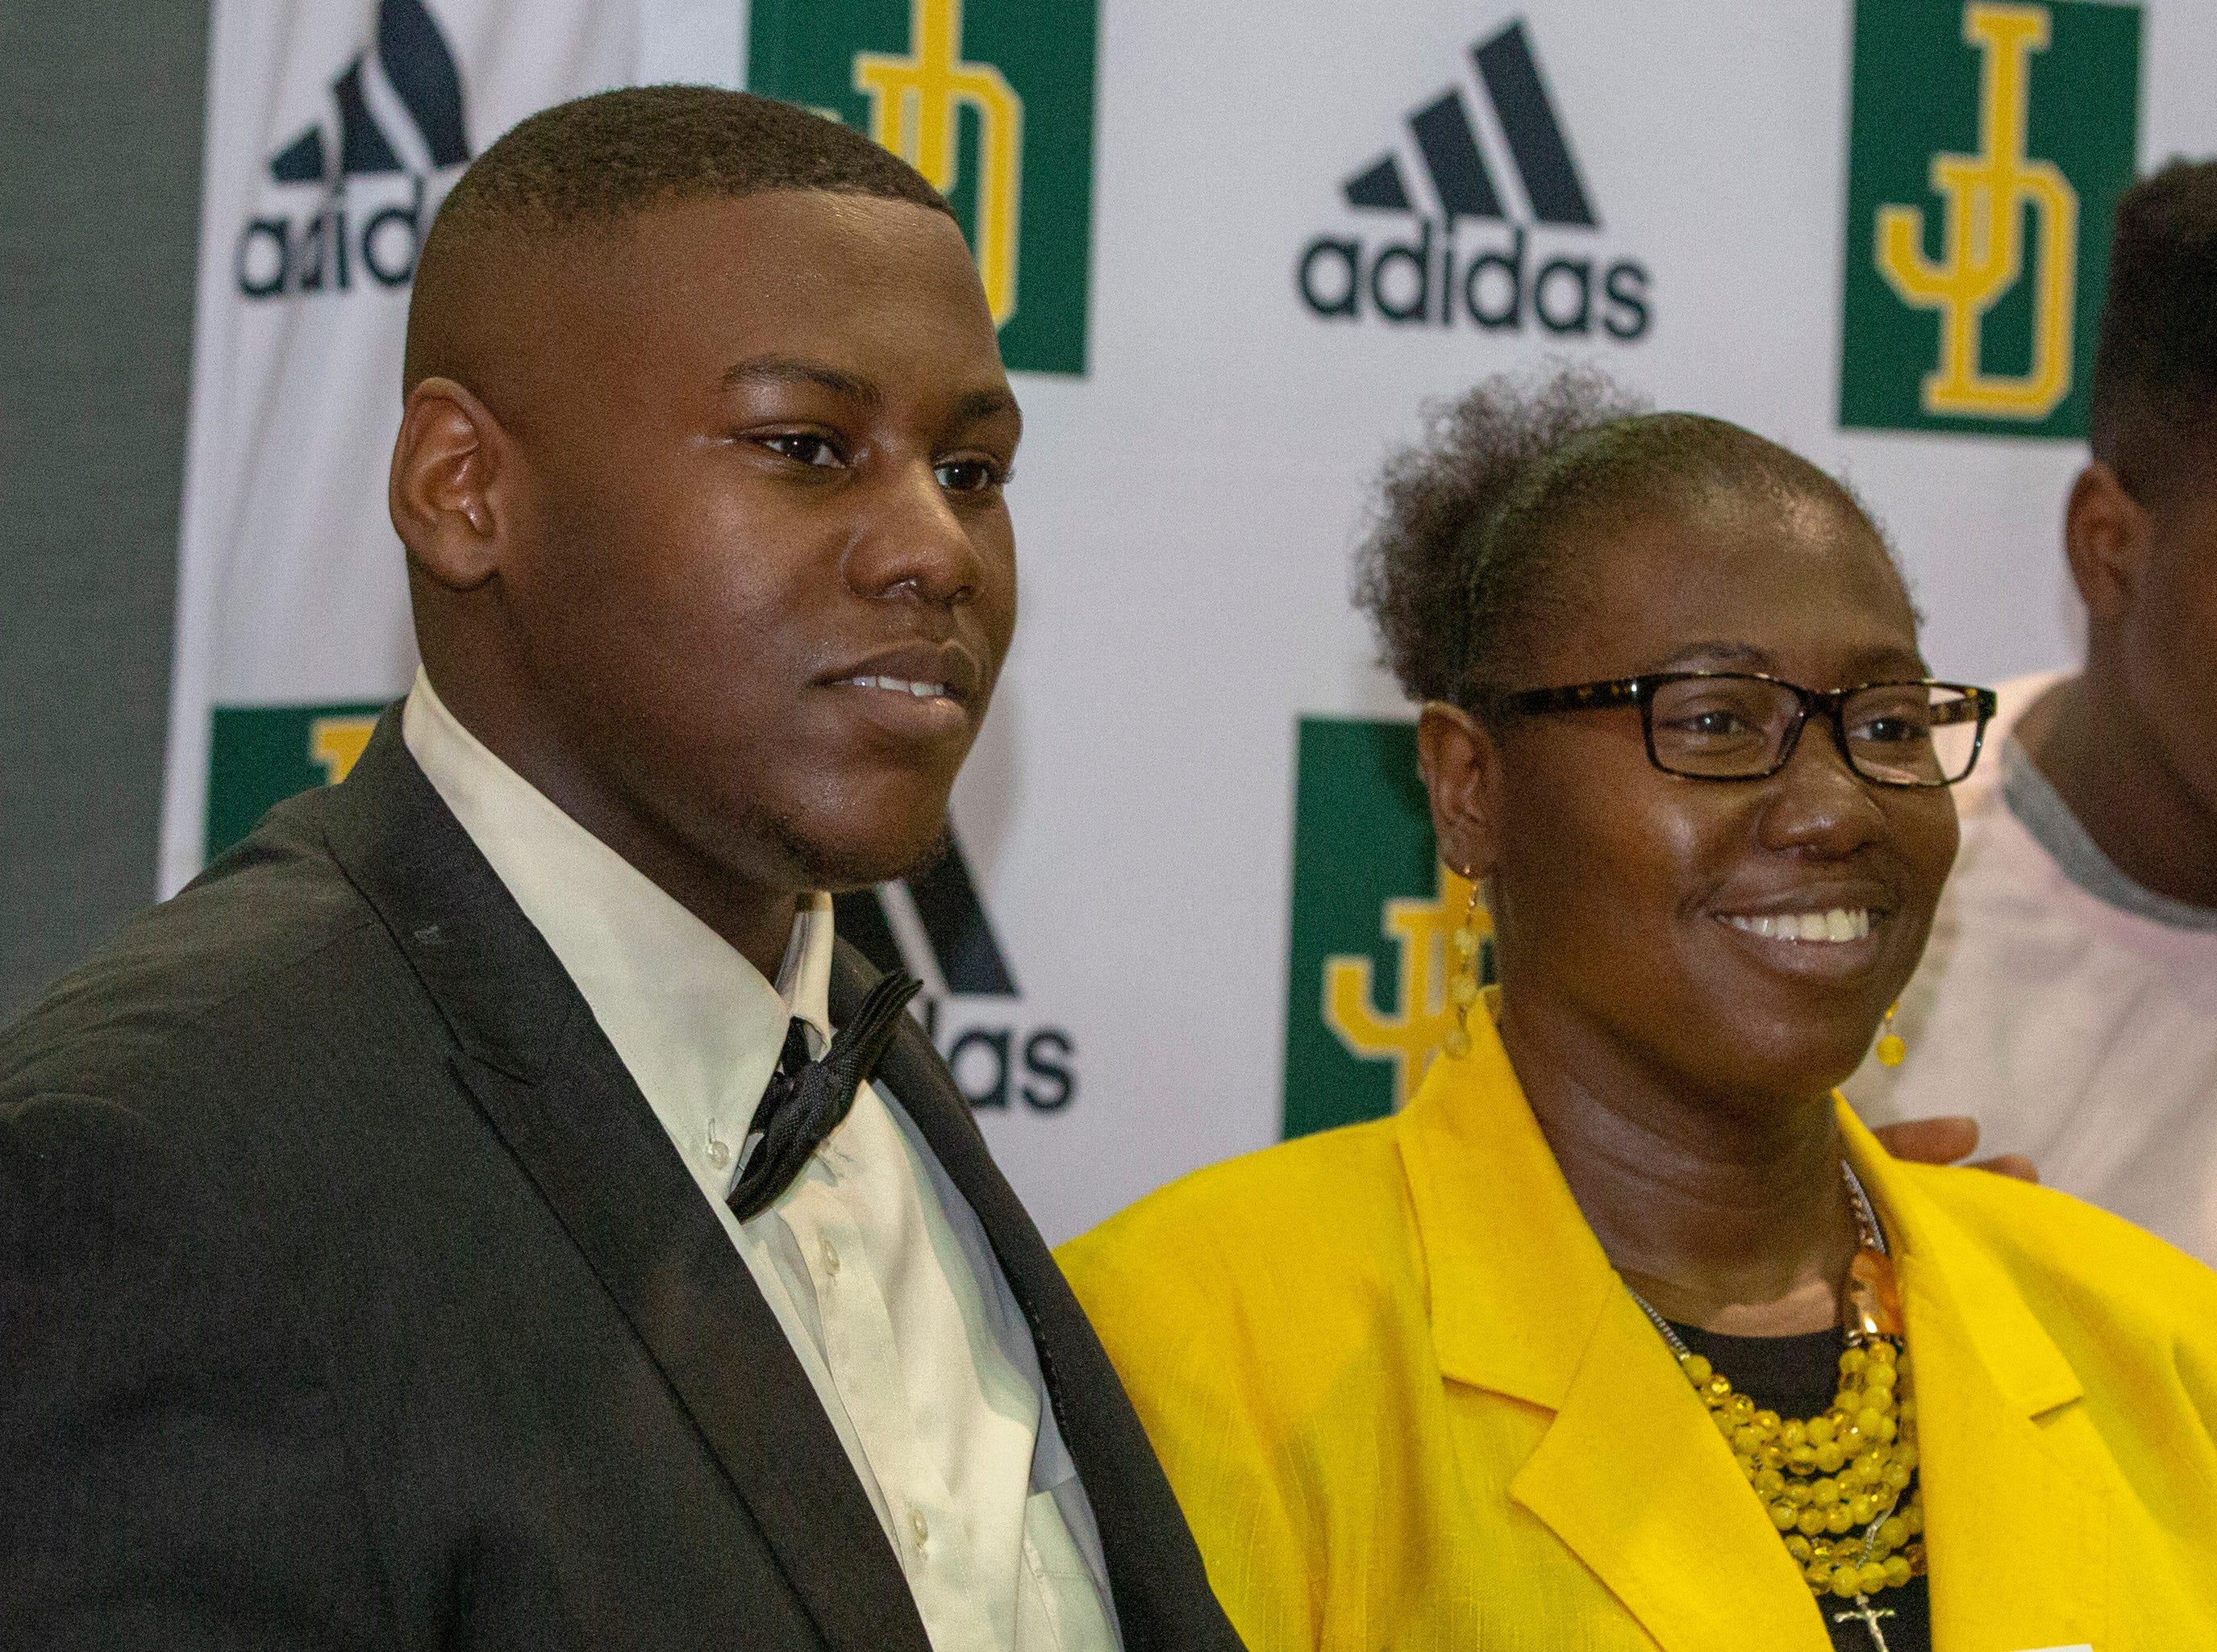 Patrick Duster, a Jeff Davis football player, will walk on at Alabama State University.